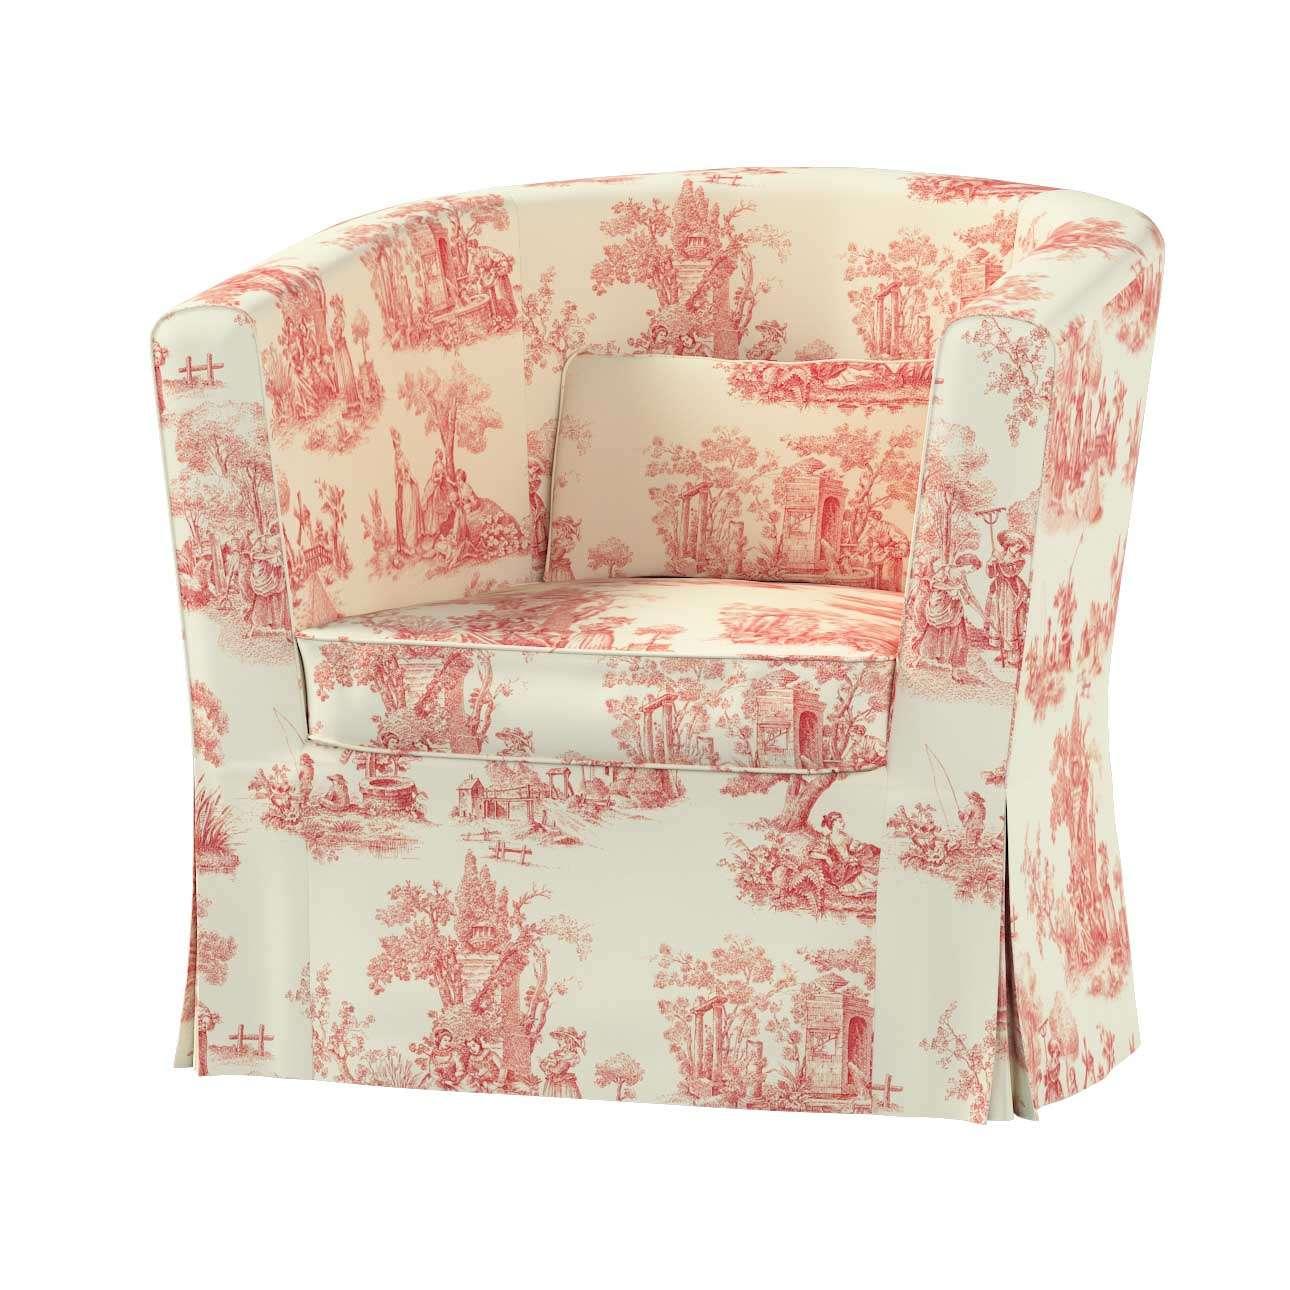 Ektorp Tullsta Sesselbezug Sesselhusse, Ektorp Tullsta von der Kollektion Avinon, Stoff: 132-15